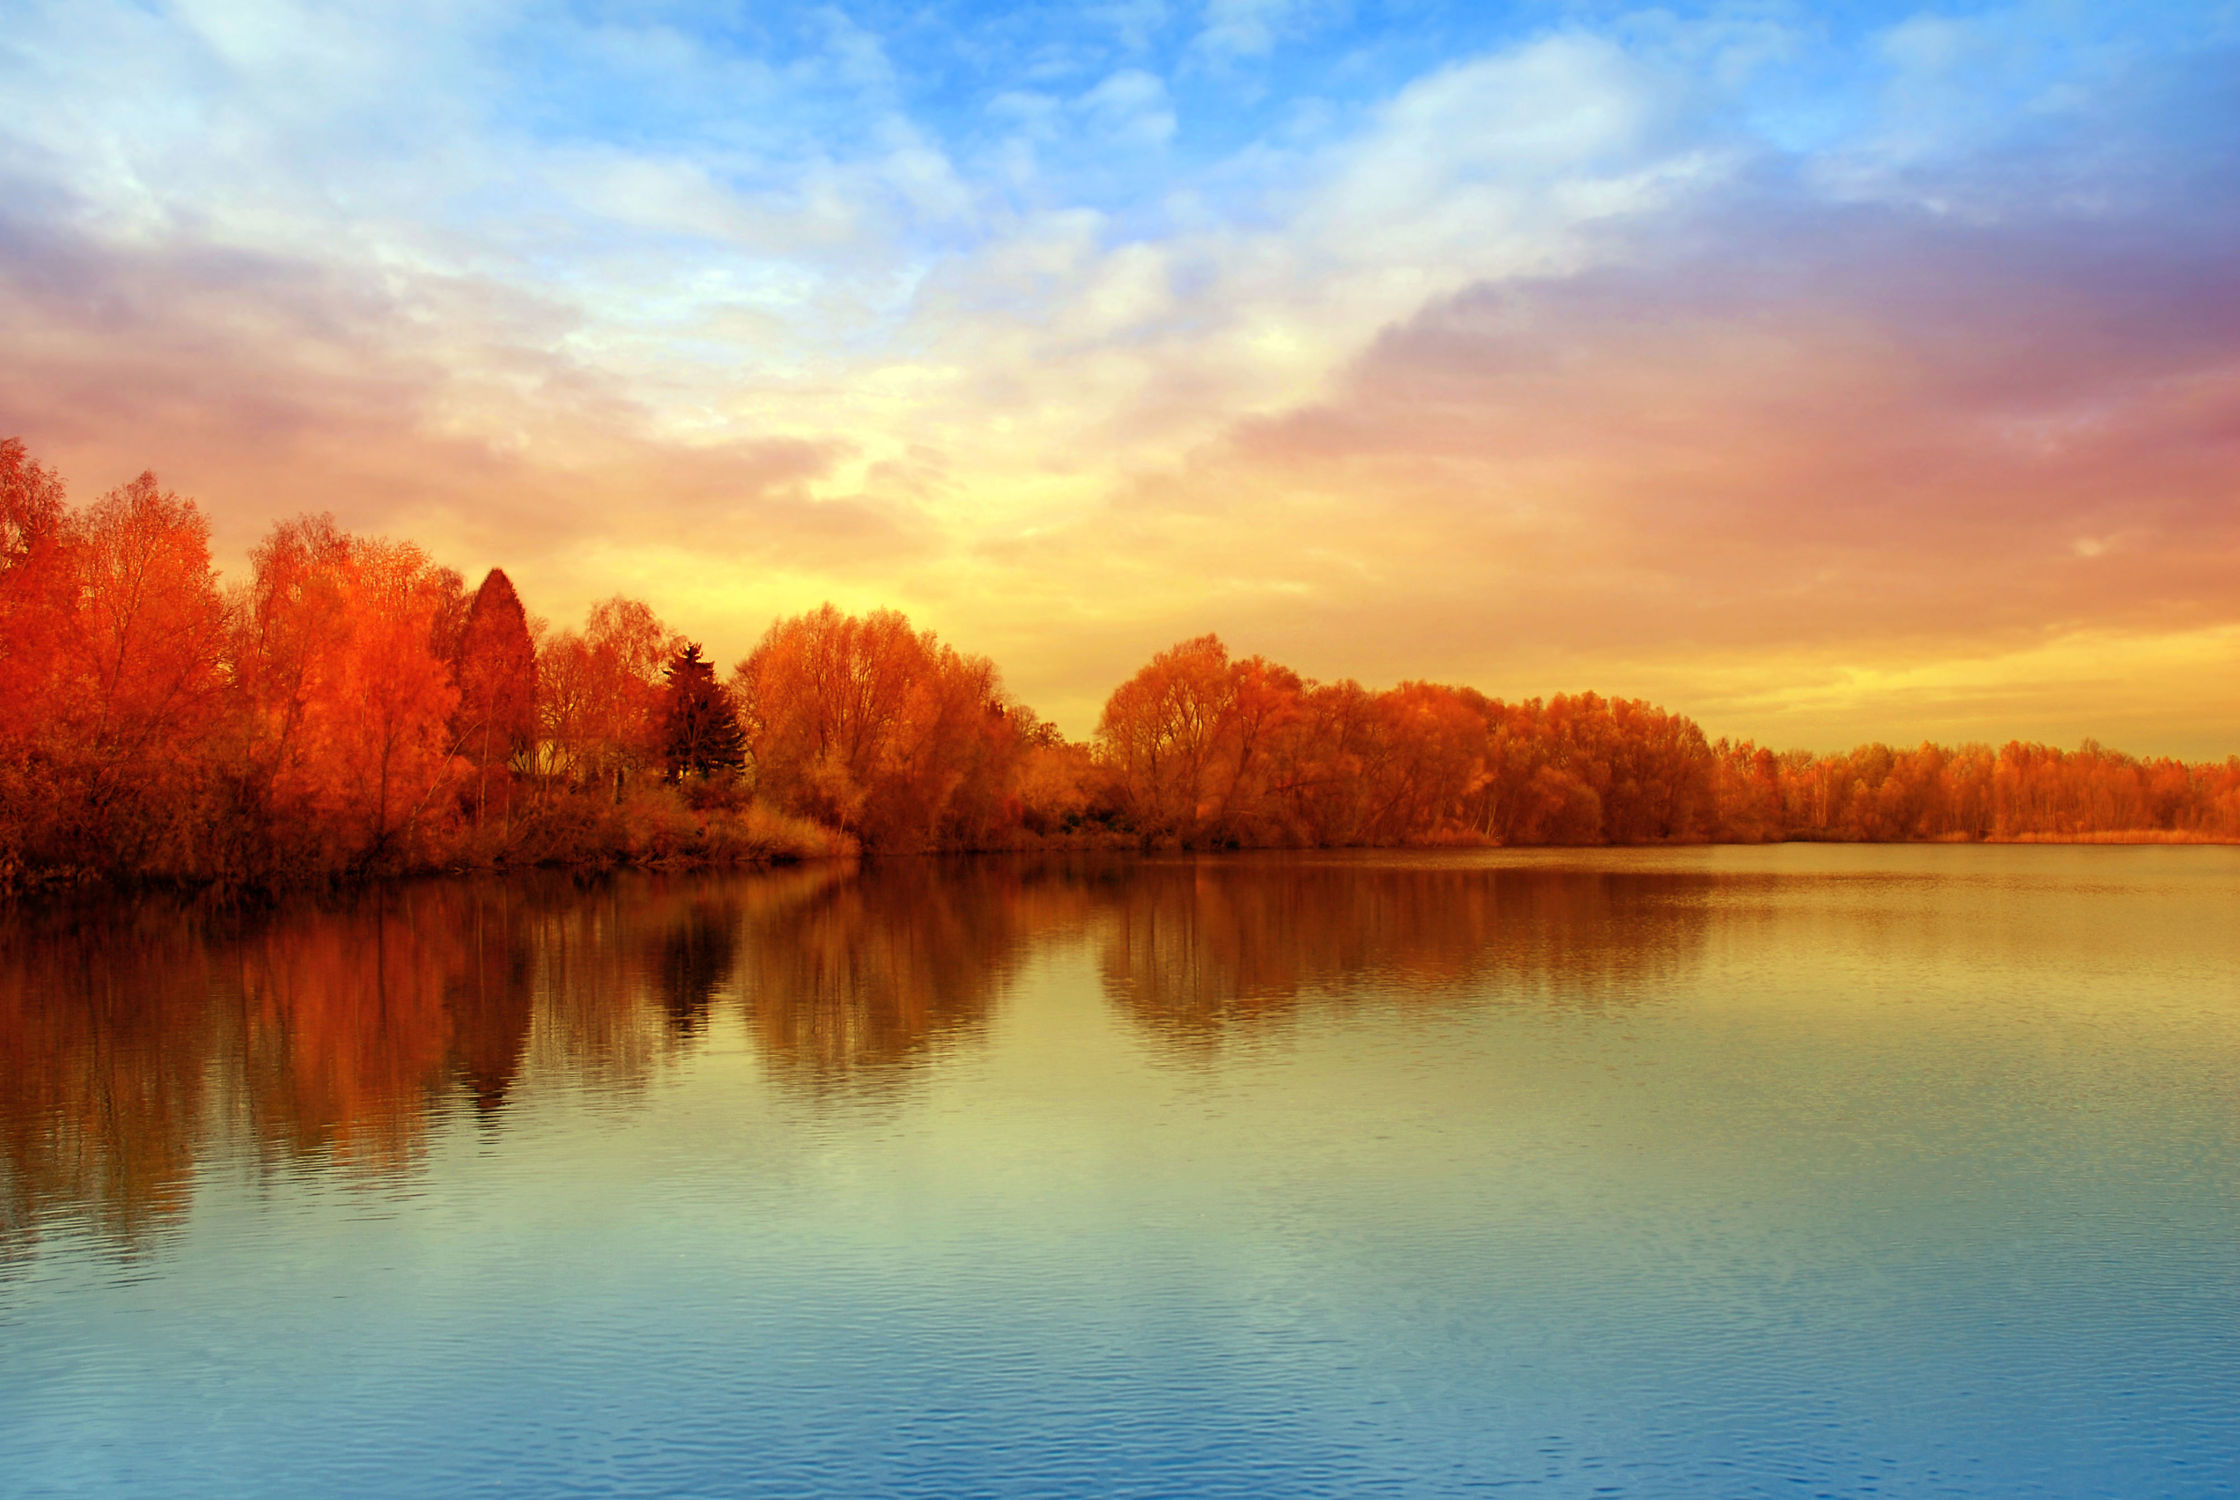 Bild mit Natur, Wasser, Landschaften, Bäume, Gewässer, Herbst, Sonnenuntergang, Sonne, Baum, Berlin, Landschaft, See, spektesee